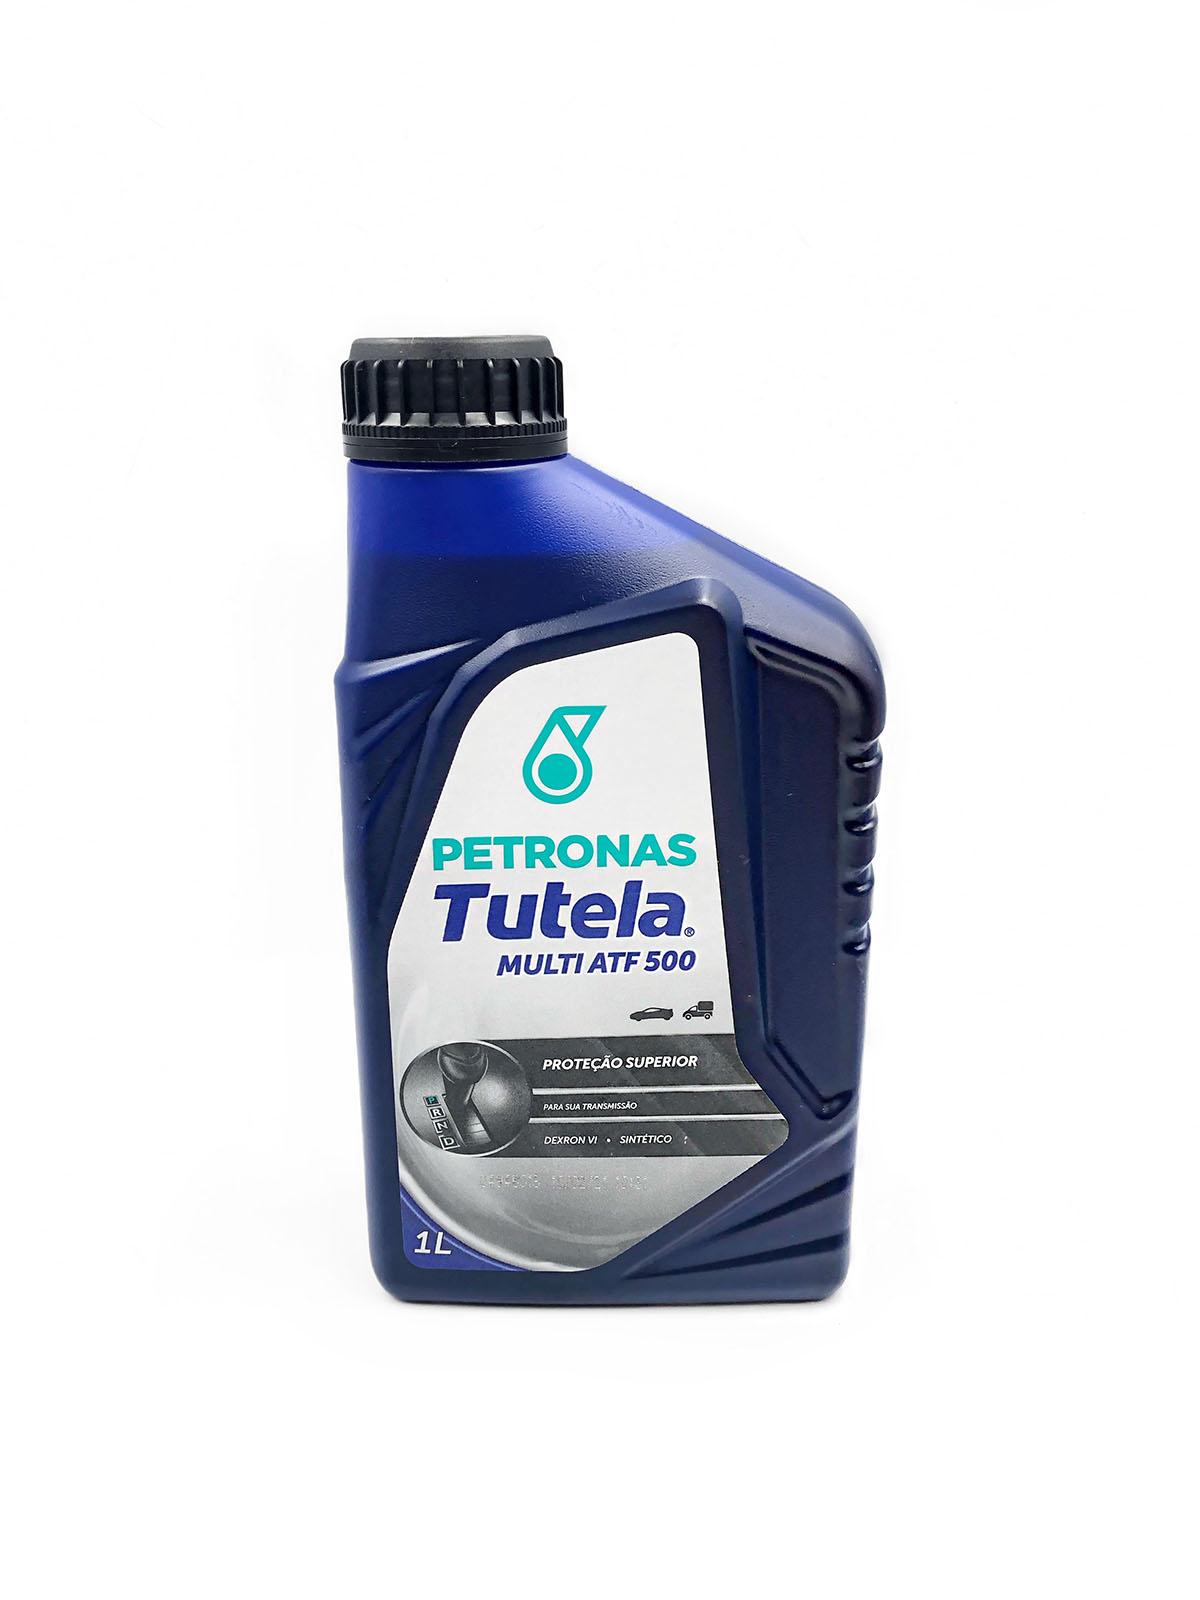 Óleo Petronas | Tutela Multi ATF 500 | Dexron VI - 1 Lt.